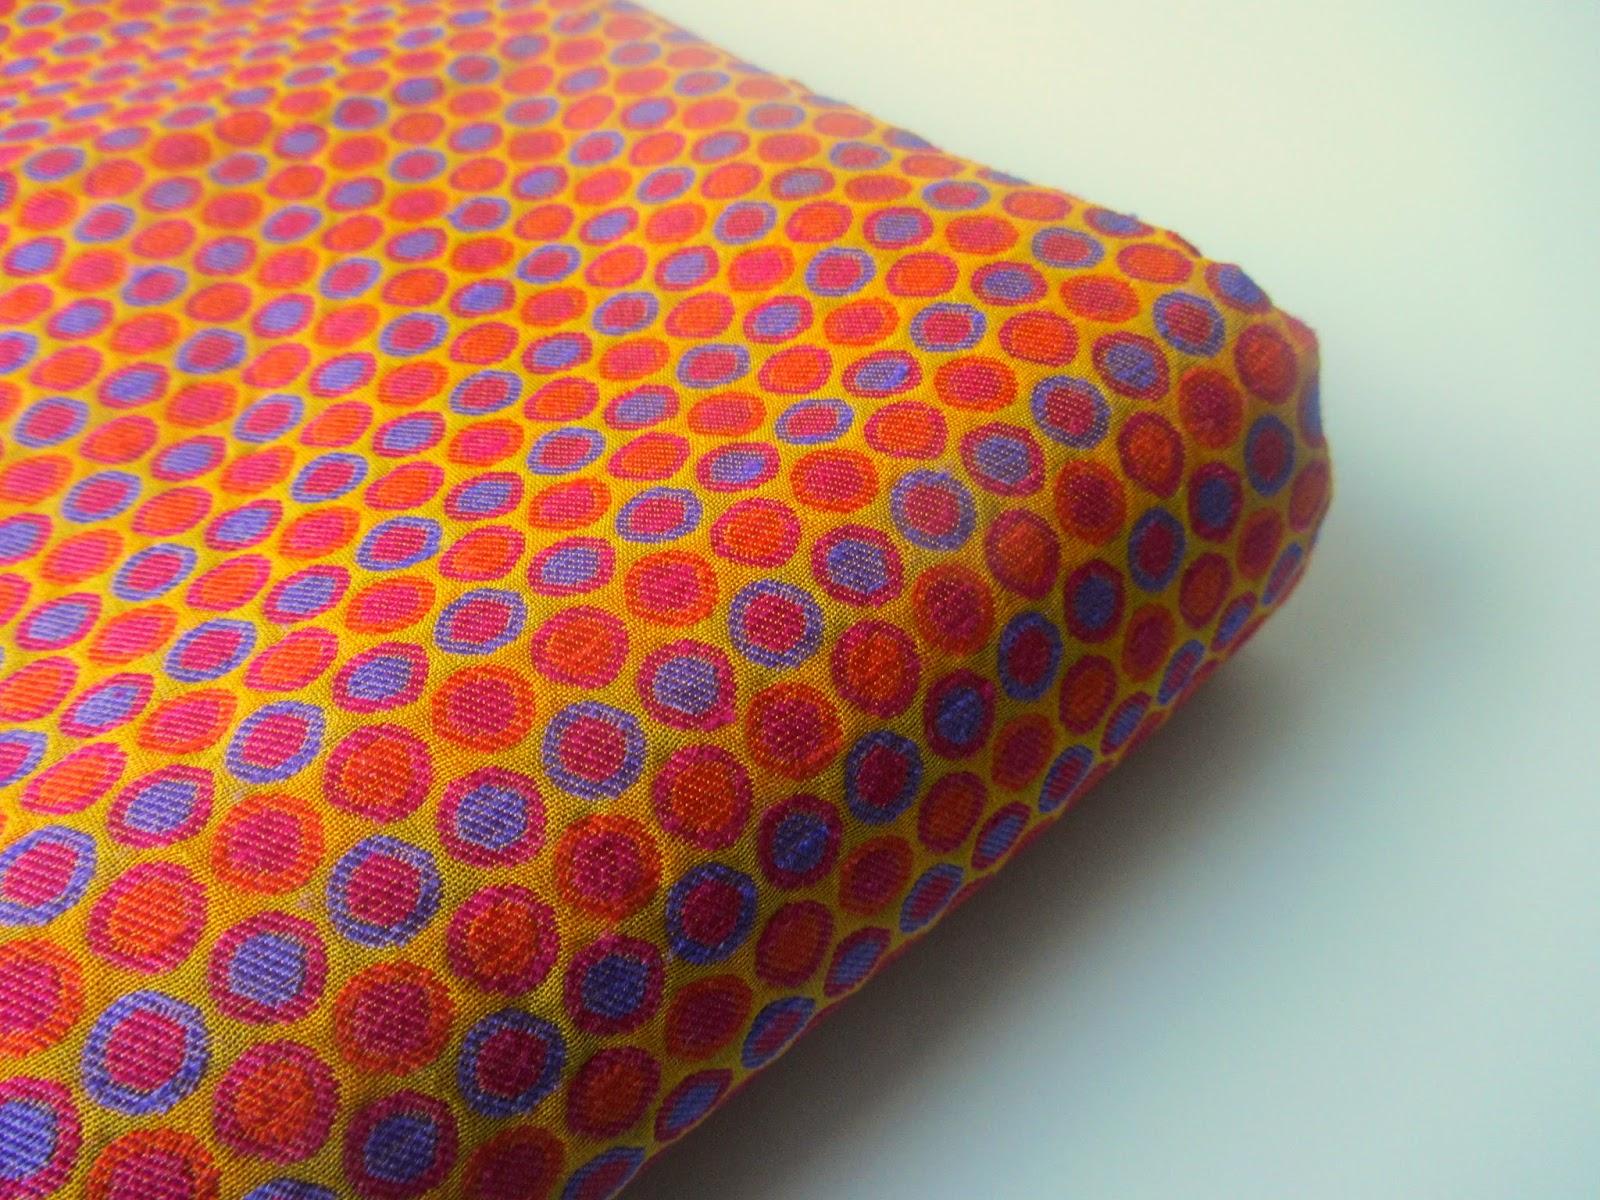 Orange blue two tone polka dots India silk brocade fabric